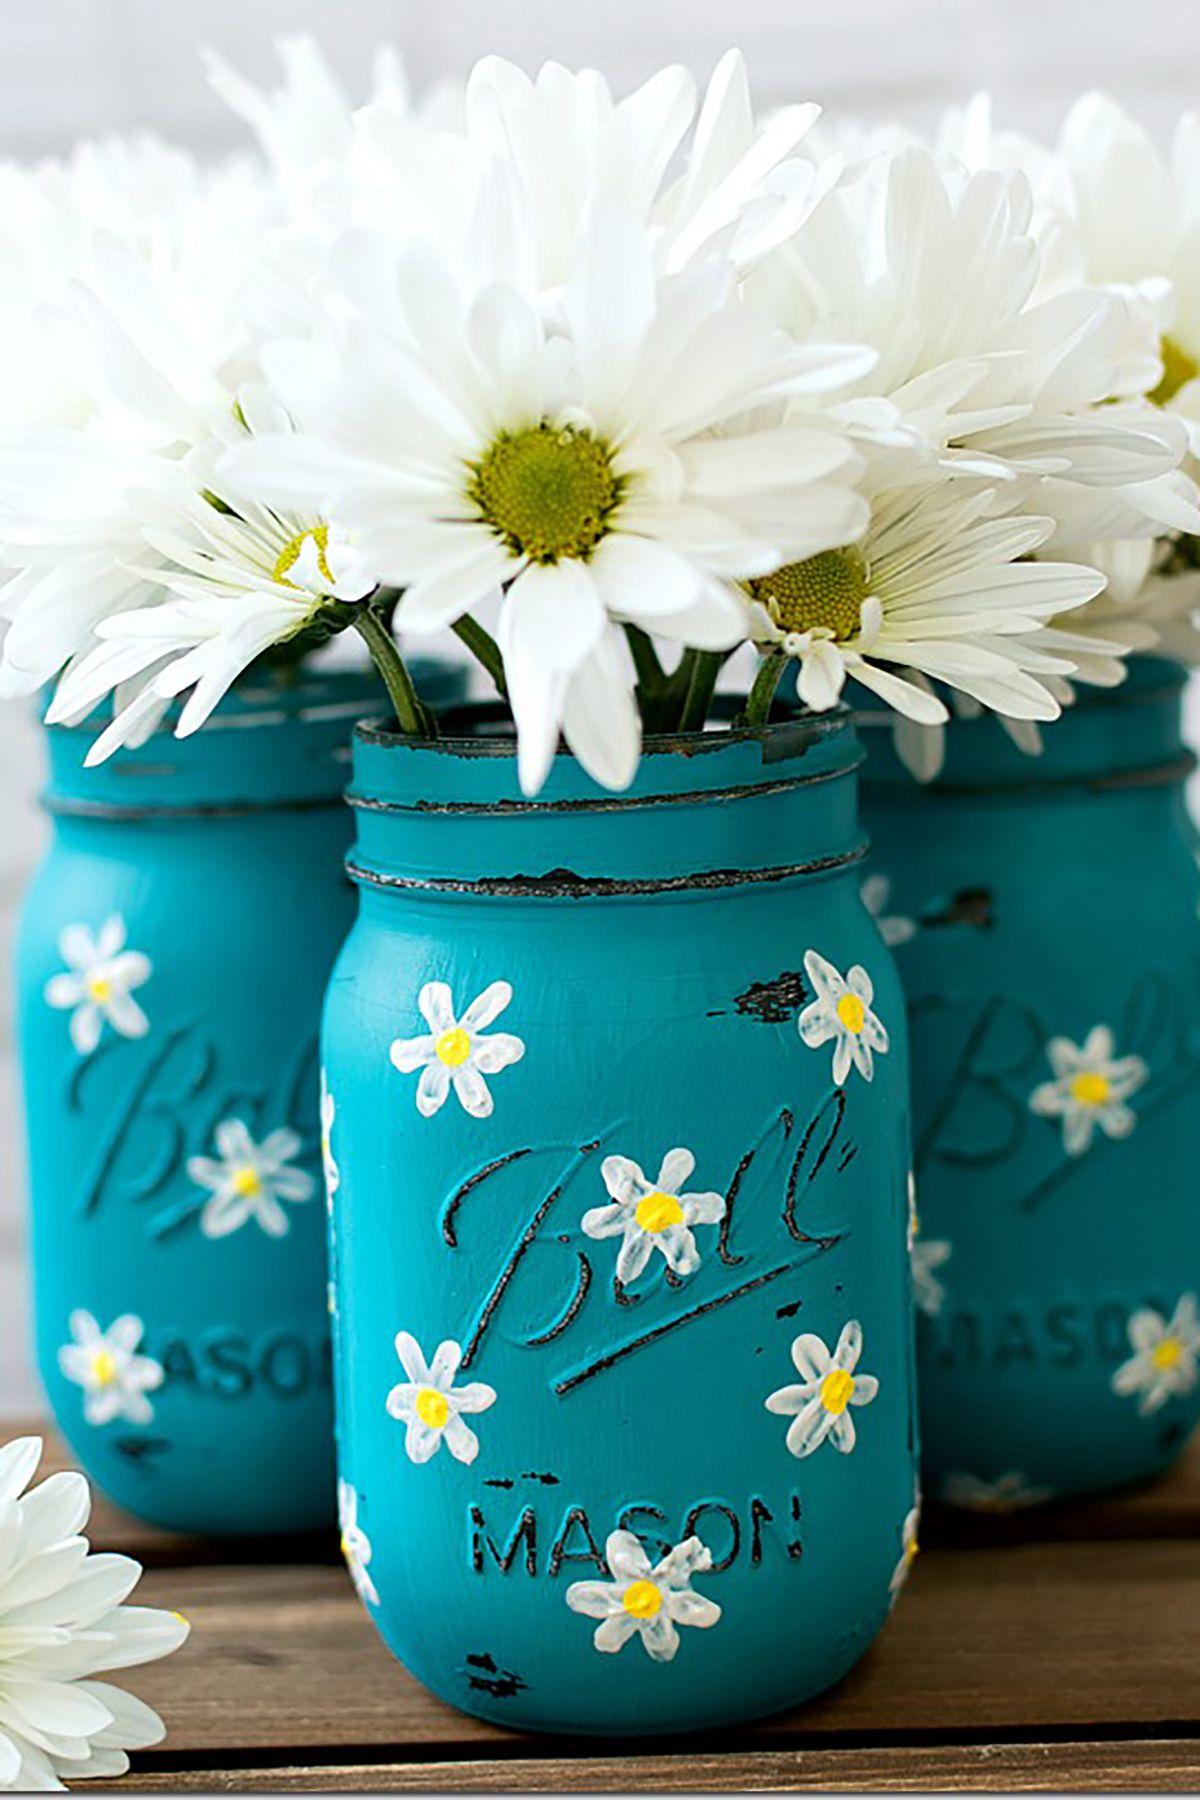 25 Beautiful Flower Crafts For Spring Mason Jar Crafts Diy Jar Crafts Mason Jar Projects